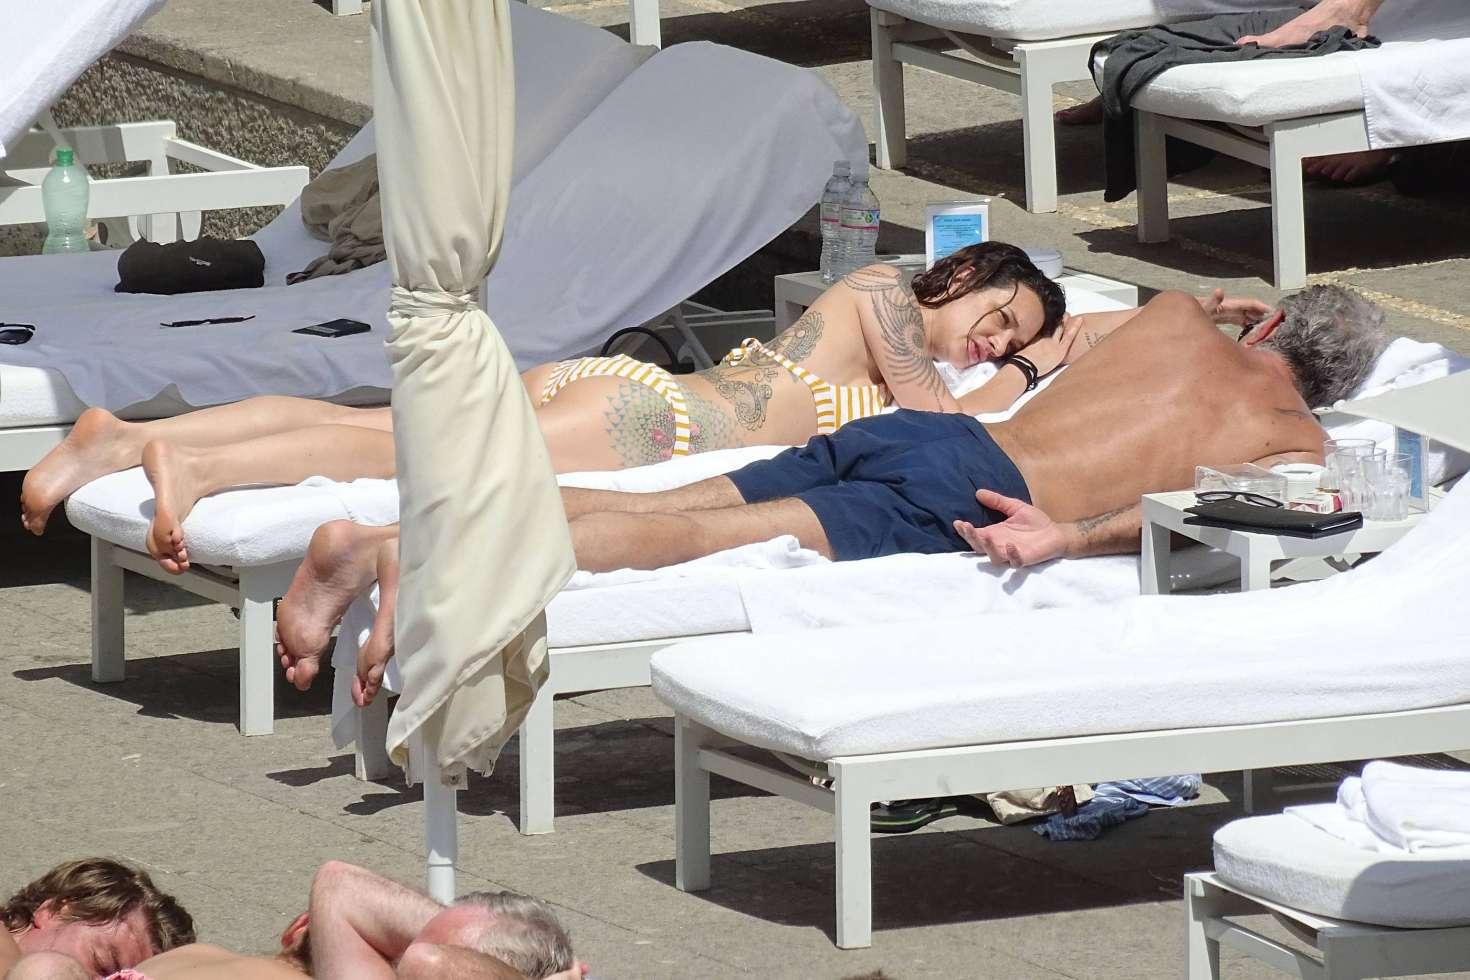 Asia Argento 2017 : Asia Argento: Bikini Candids at the hotel swimming pool in Rome-07